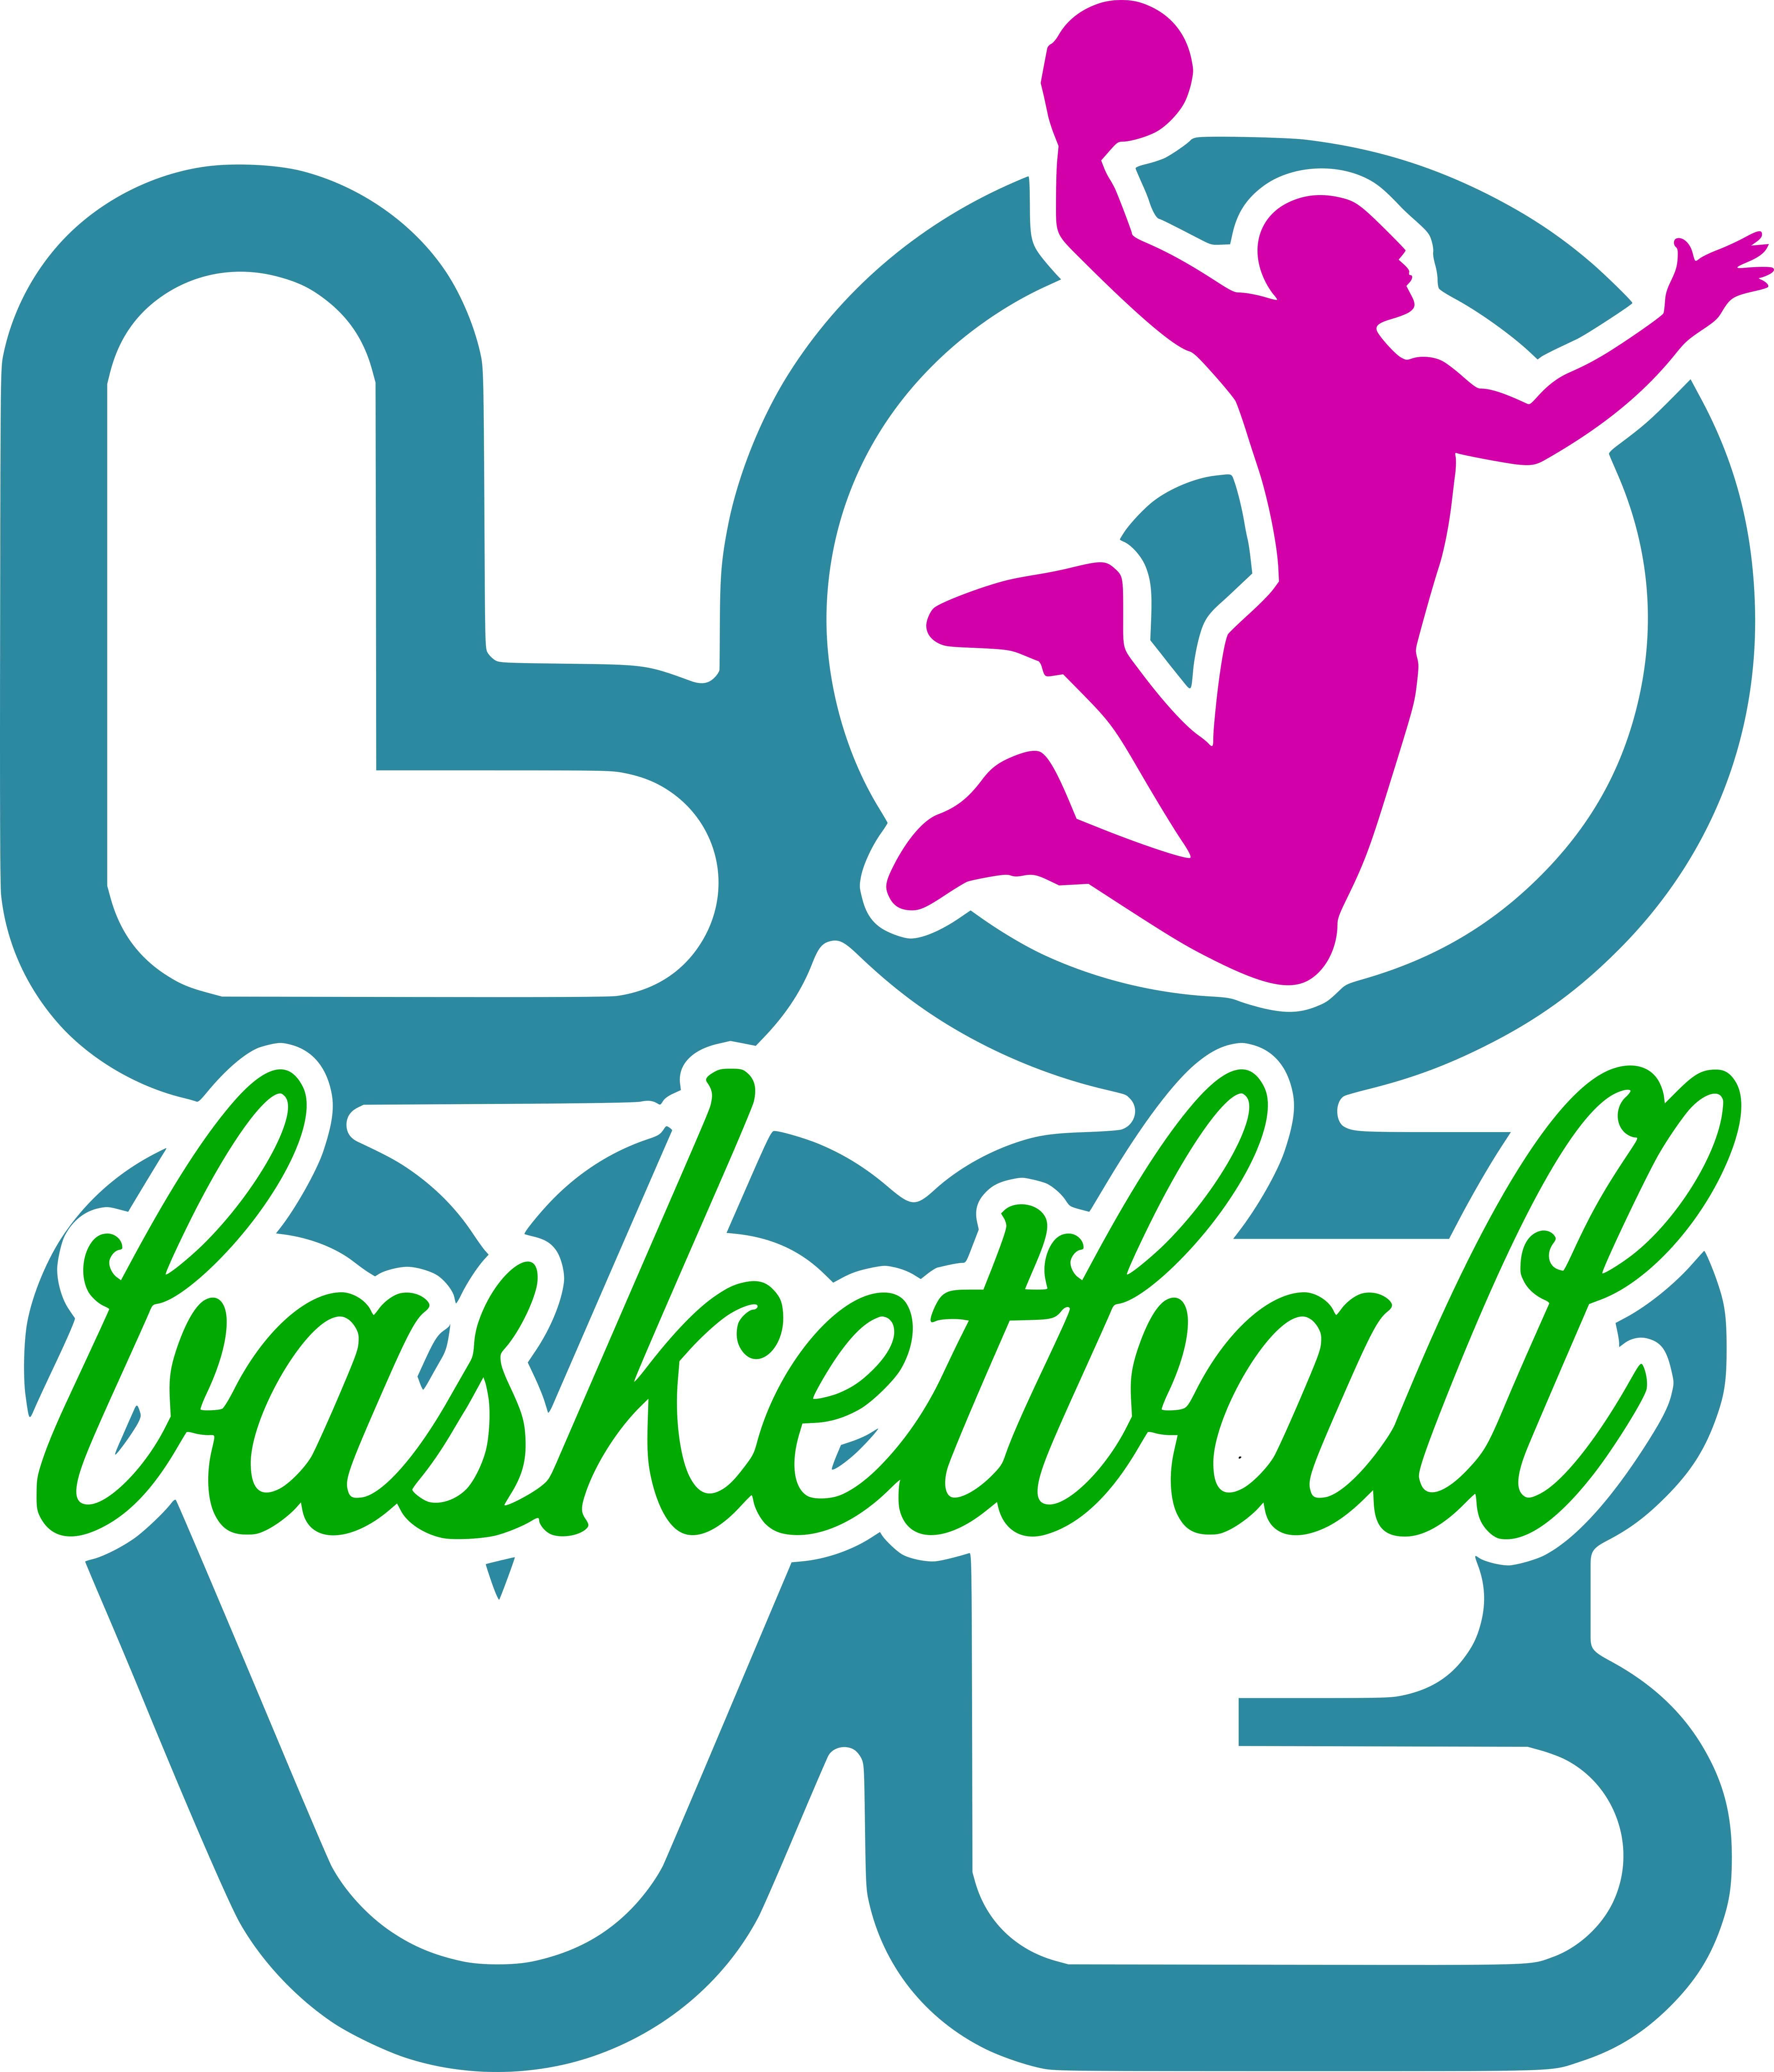 Download FREE Basketball SVG File - Free SVG Files   Free ...